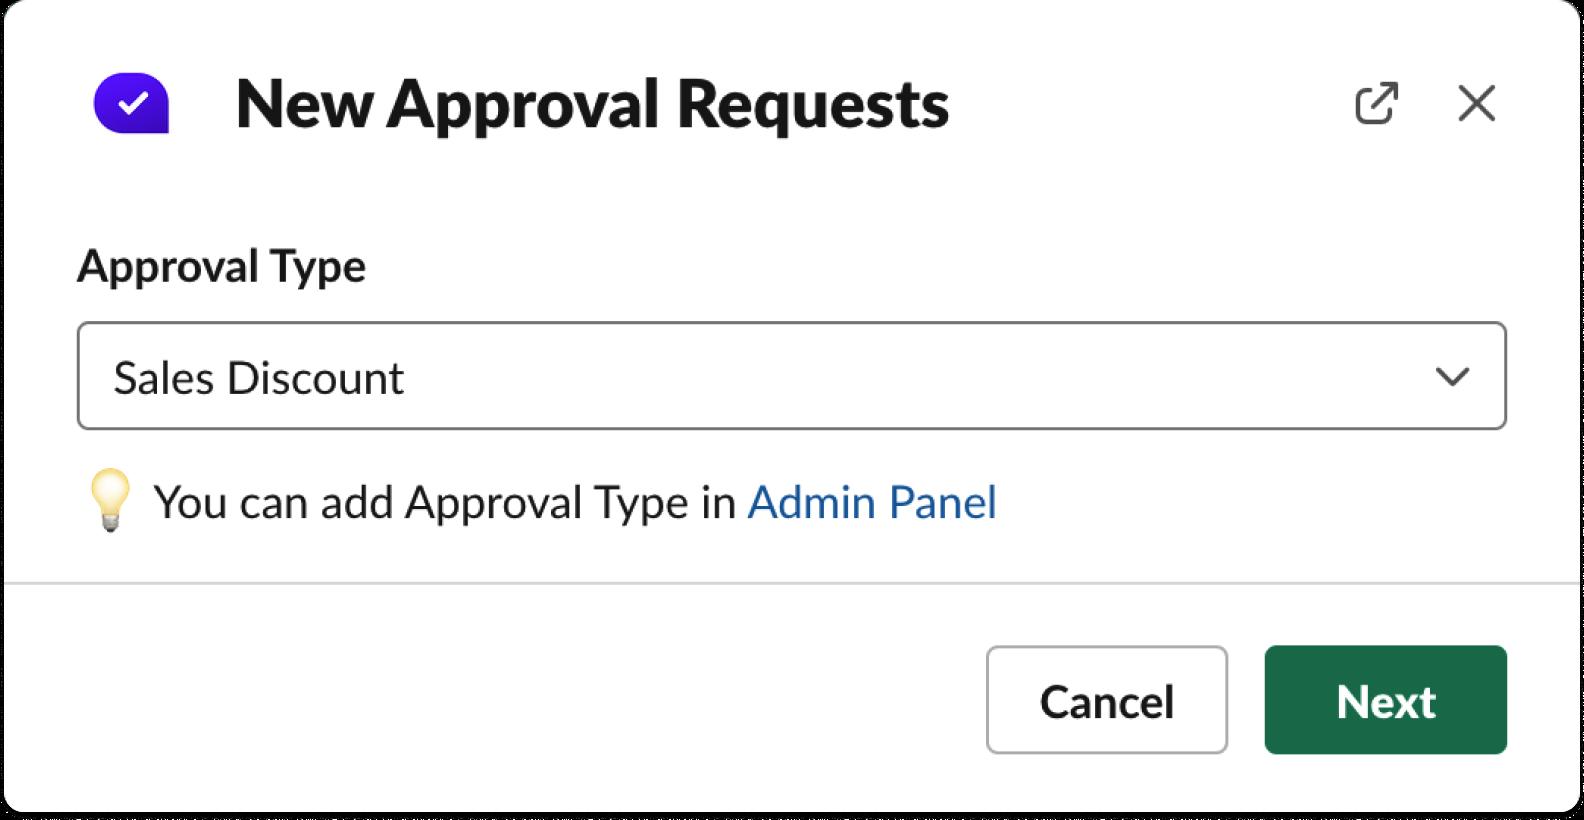 Specify approval type